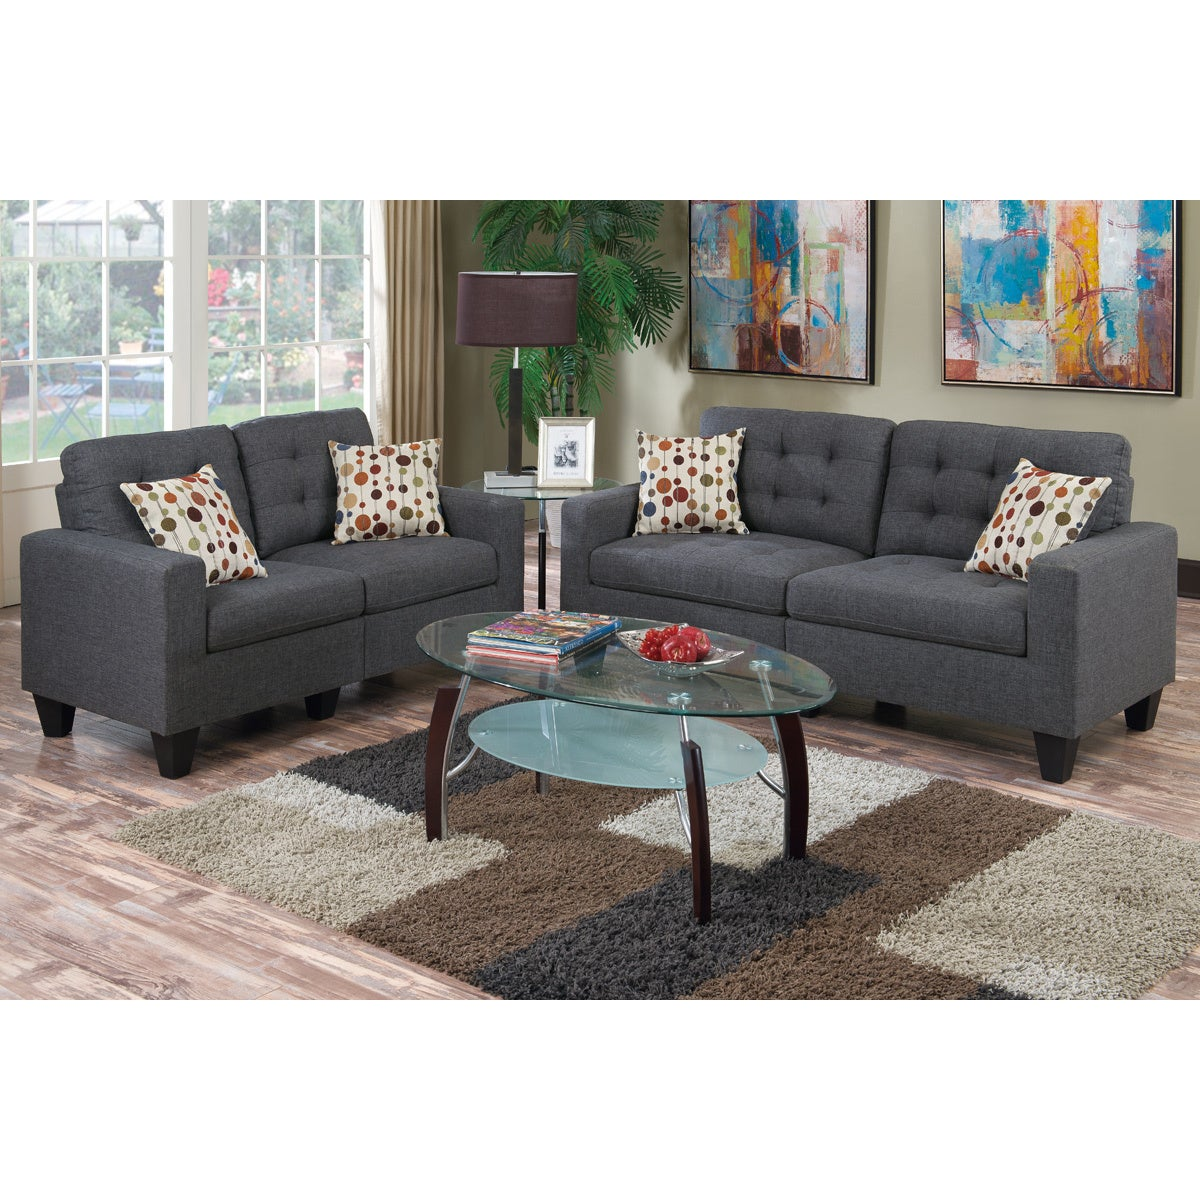 Bobkona Windsor Linen Like Poly Fabric 2 Piece Sofa And Loveseat Set Free Shipping Today 15219790